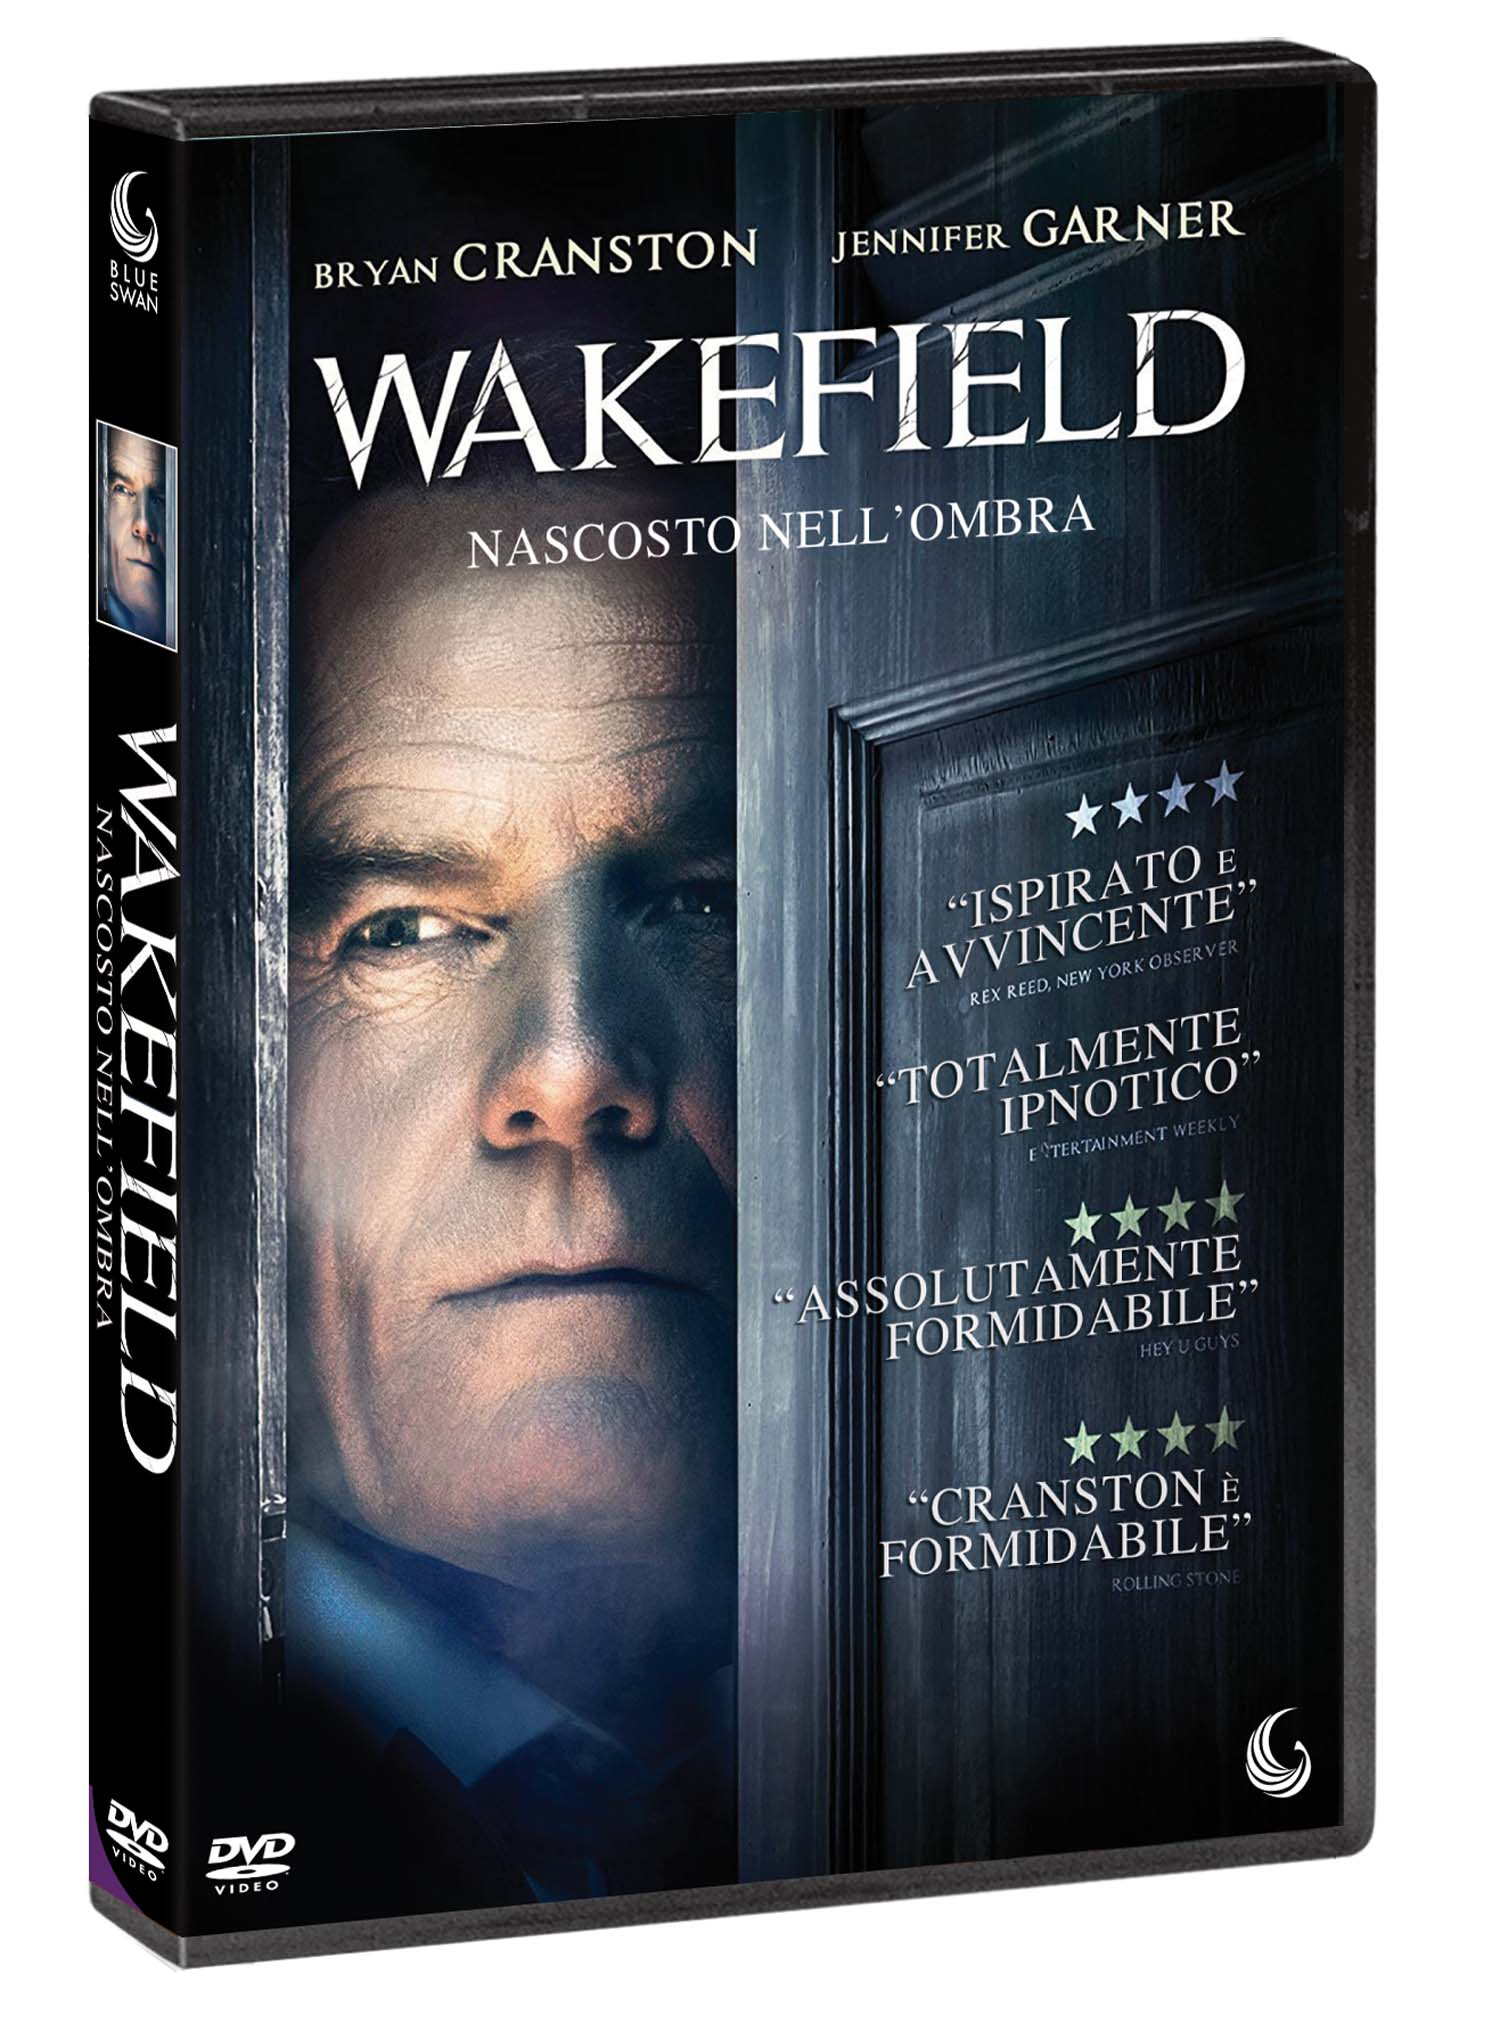 WAKEFIELD - NASCOSTO NELL'OMBRA (DVD)